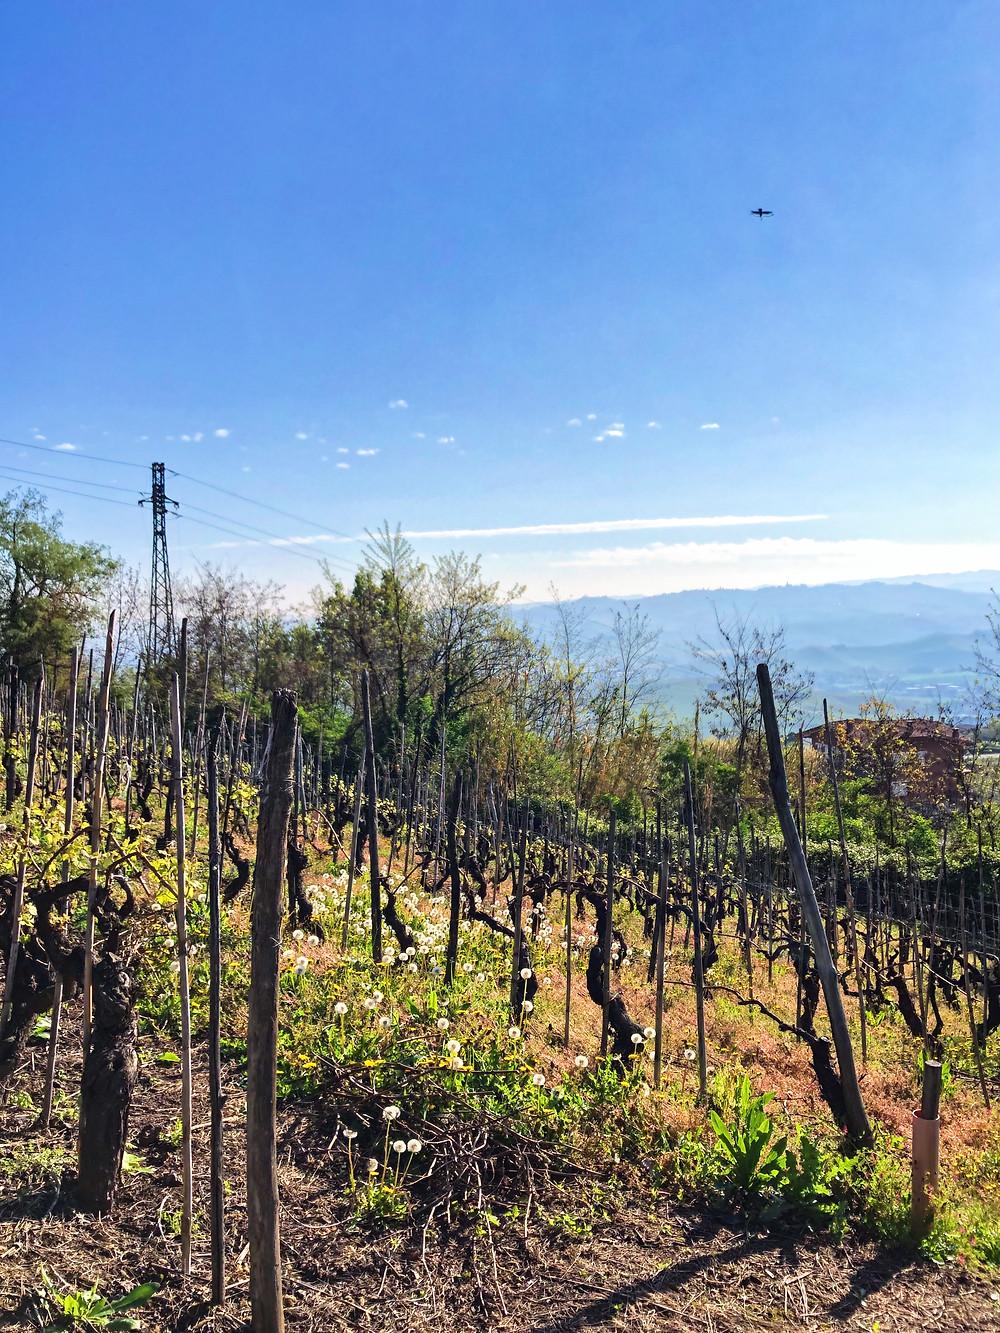 Barolo vineyards in La Morra with Nebbiolo vines in spring at early budbreak